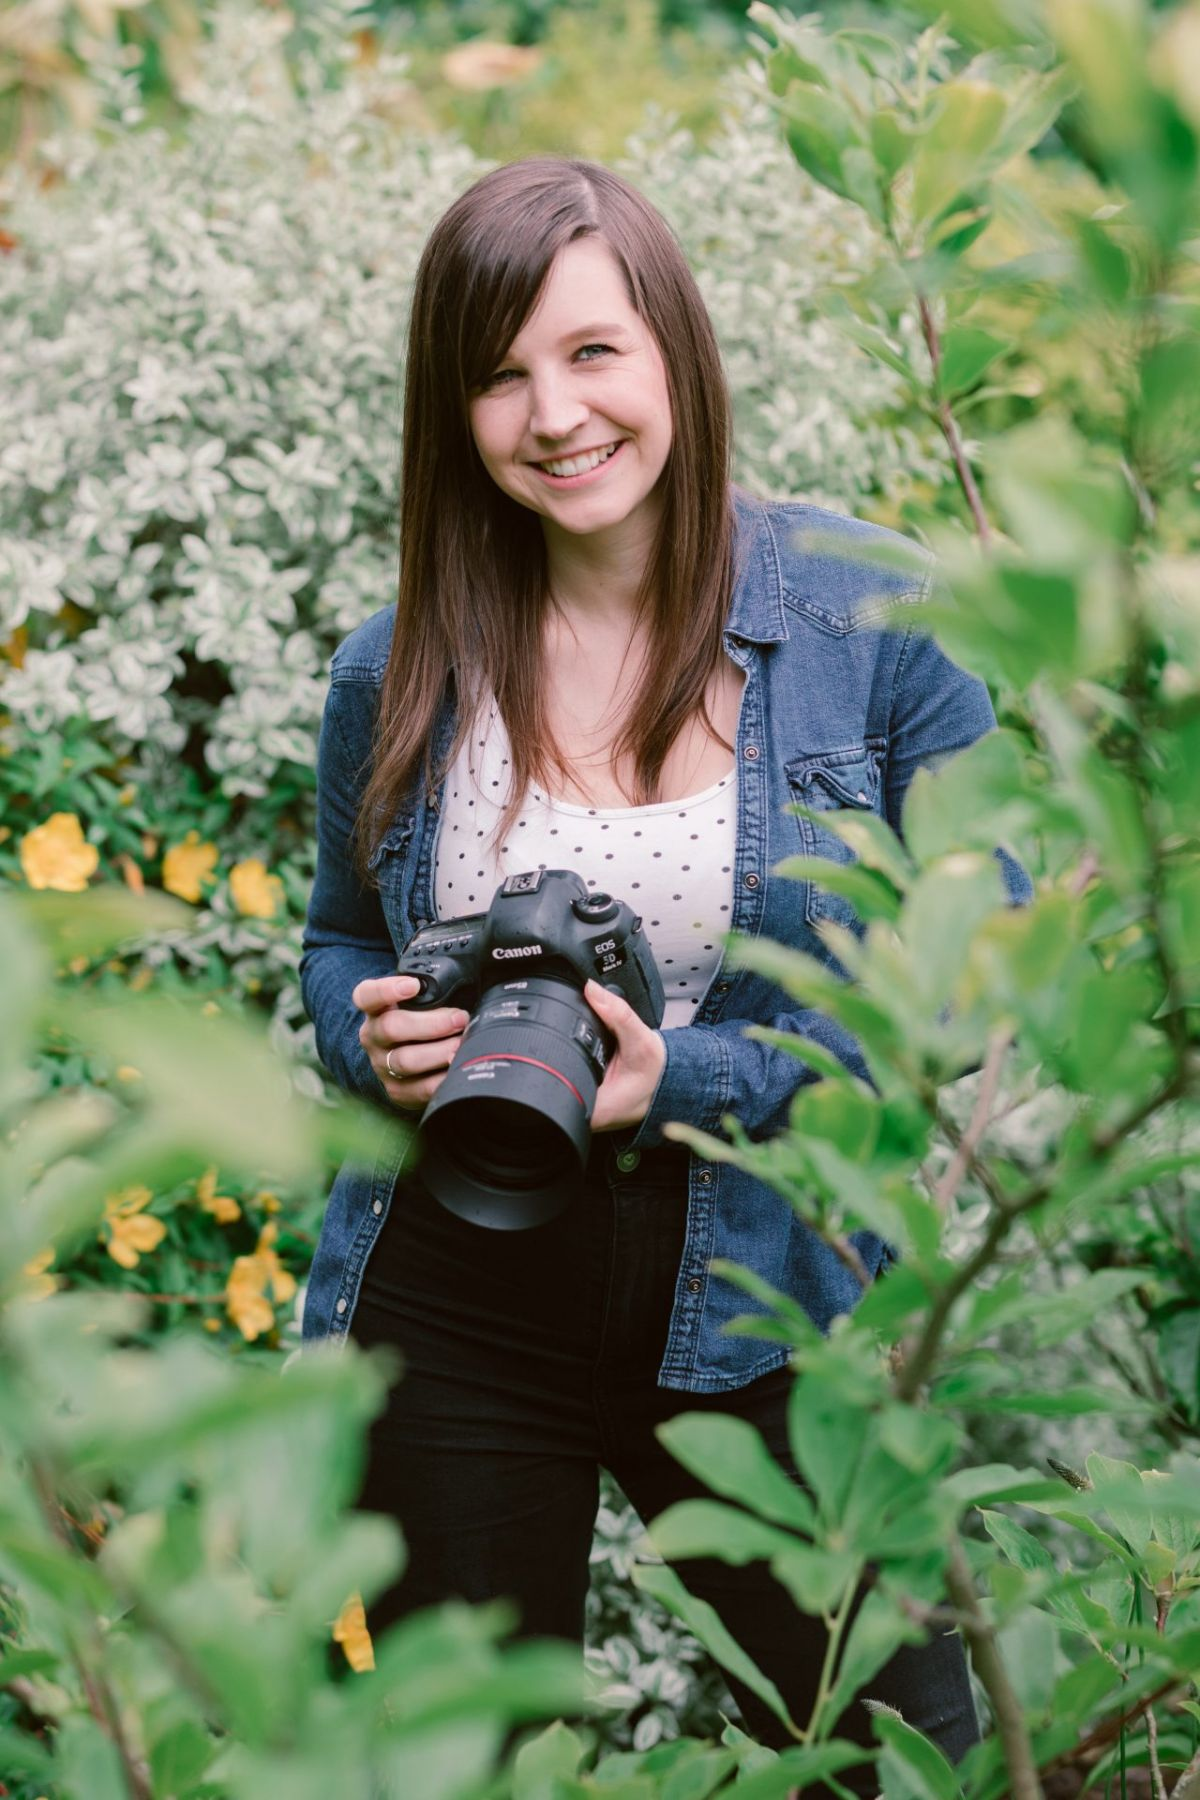 Lucylou photography headshot